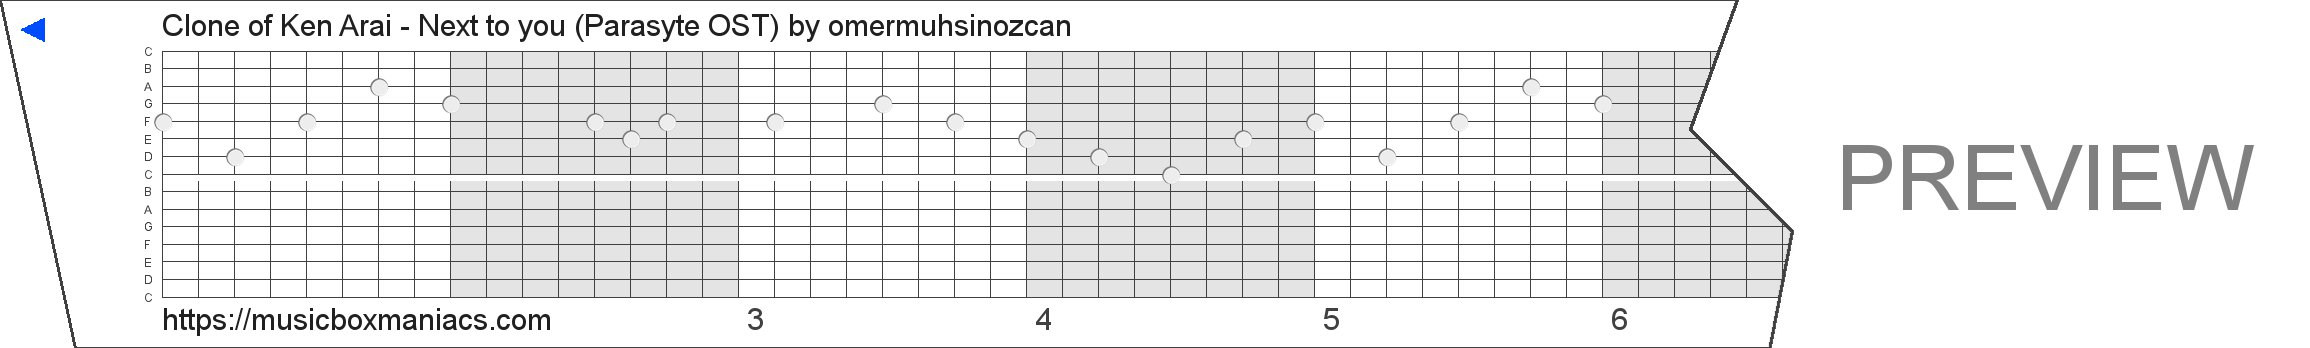 Clone of Ken Arai - Next to you (Parasyte OST) 15 note music box paper strip